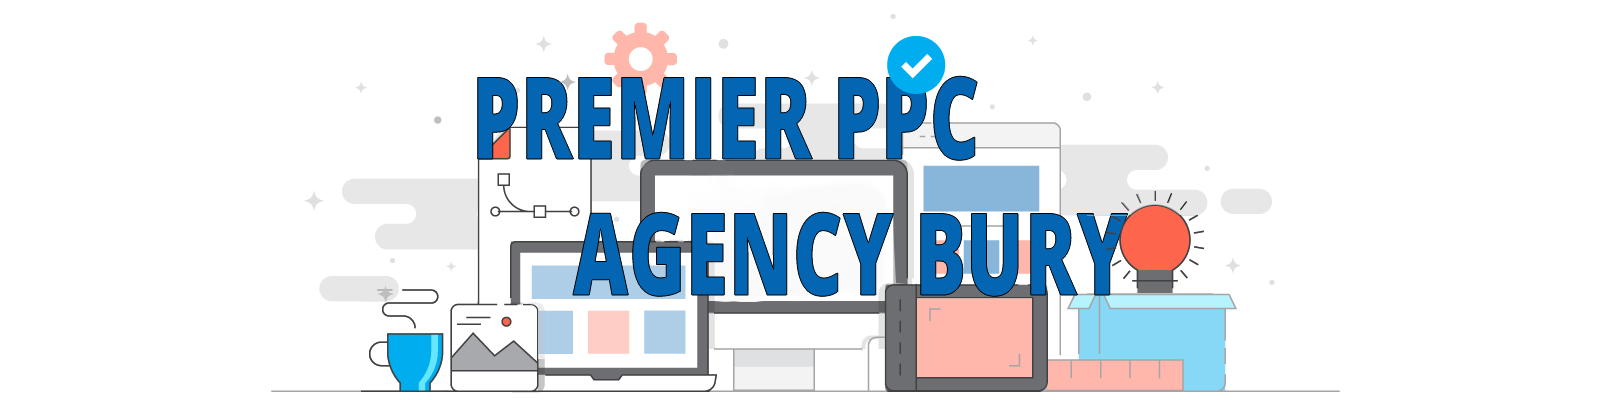 seek social premier ppc agency bury header with transparent background